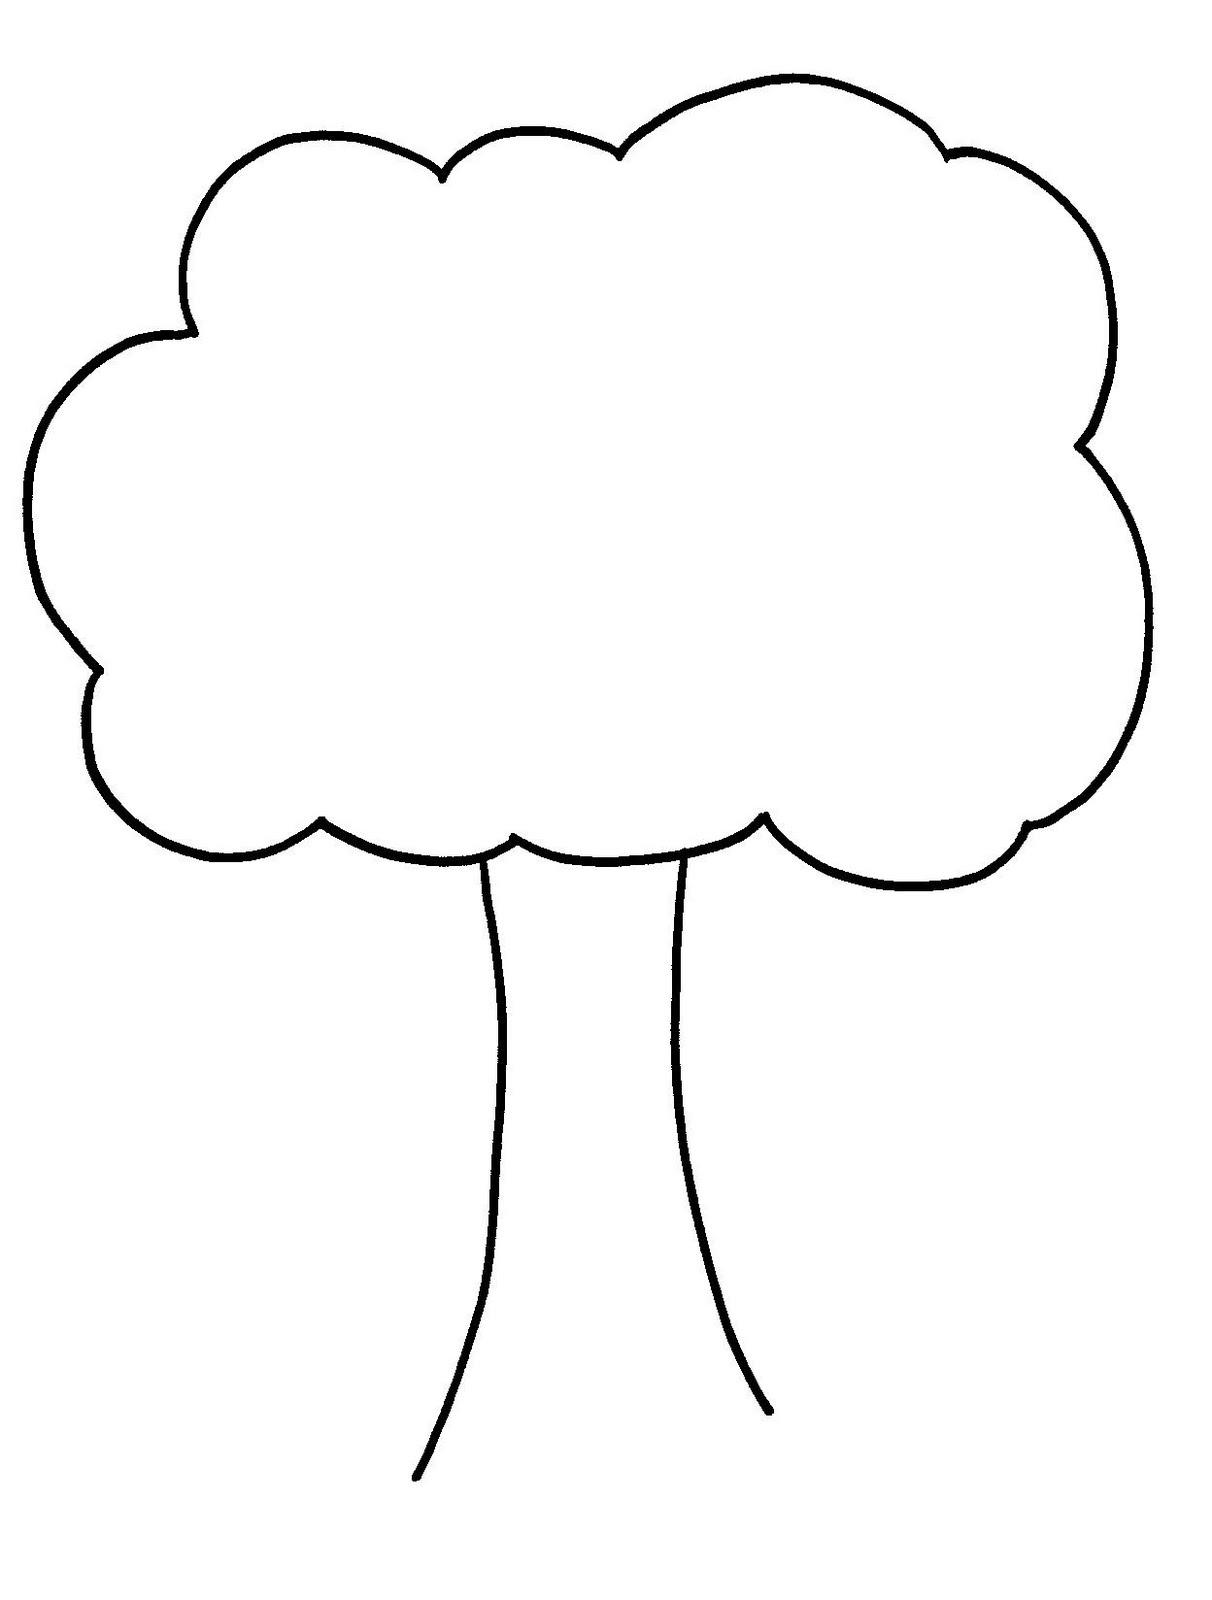 1212x1600 Apple Tree Outline Clip Art 25